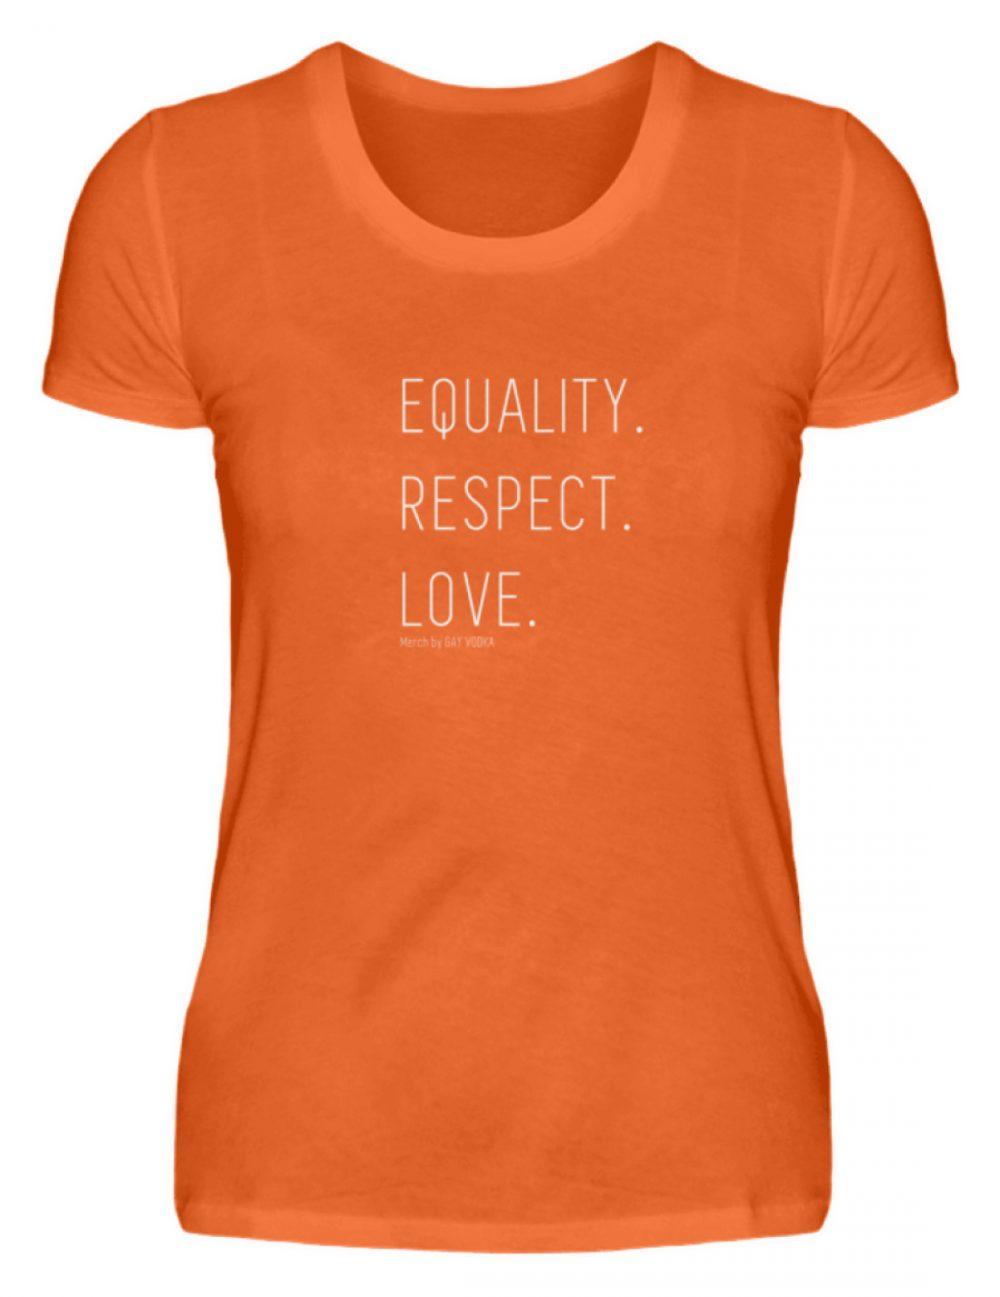 EQUALITY. RESPECT. LOVE. - Damenshirt-1692